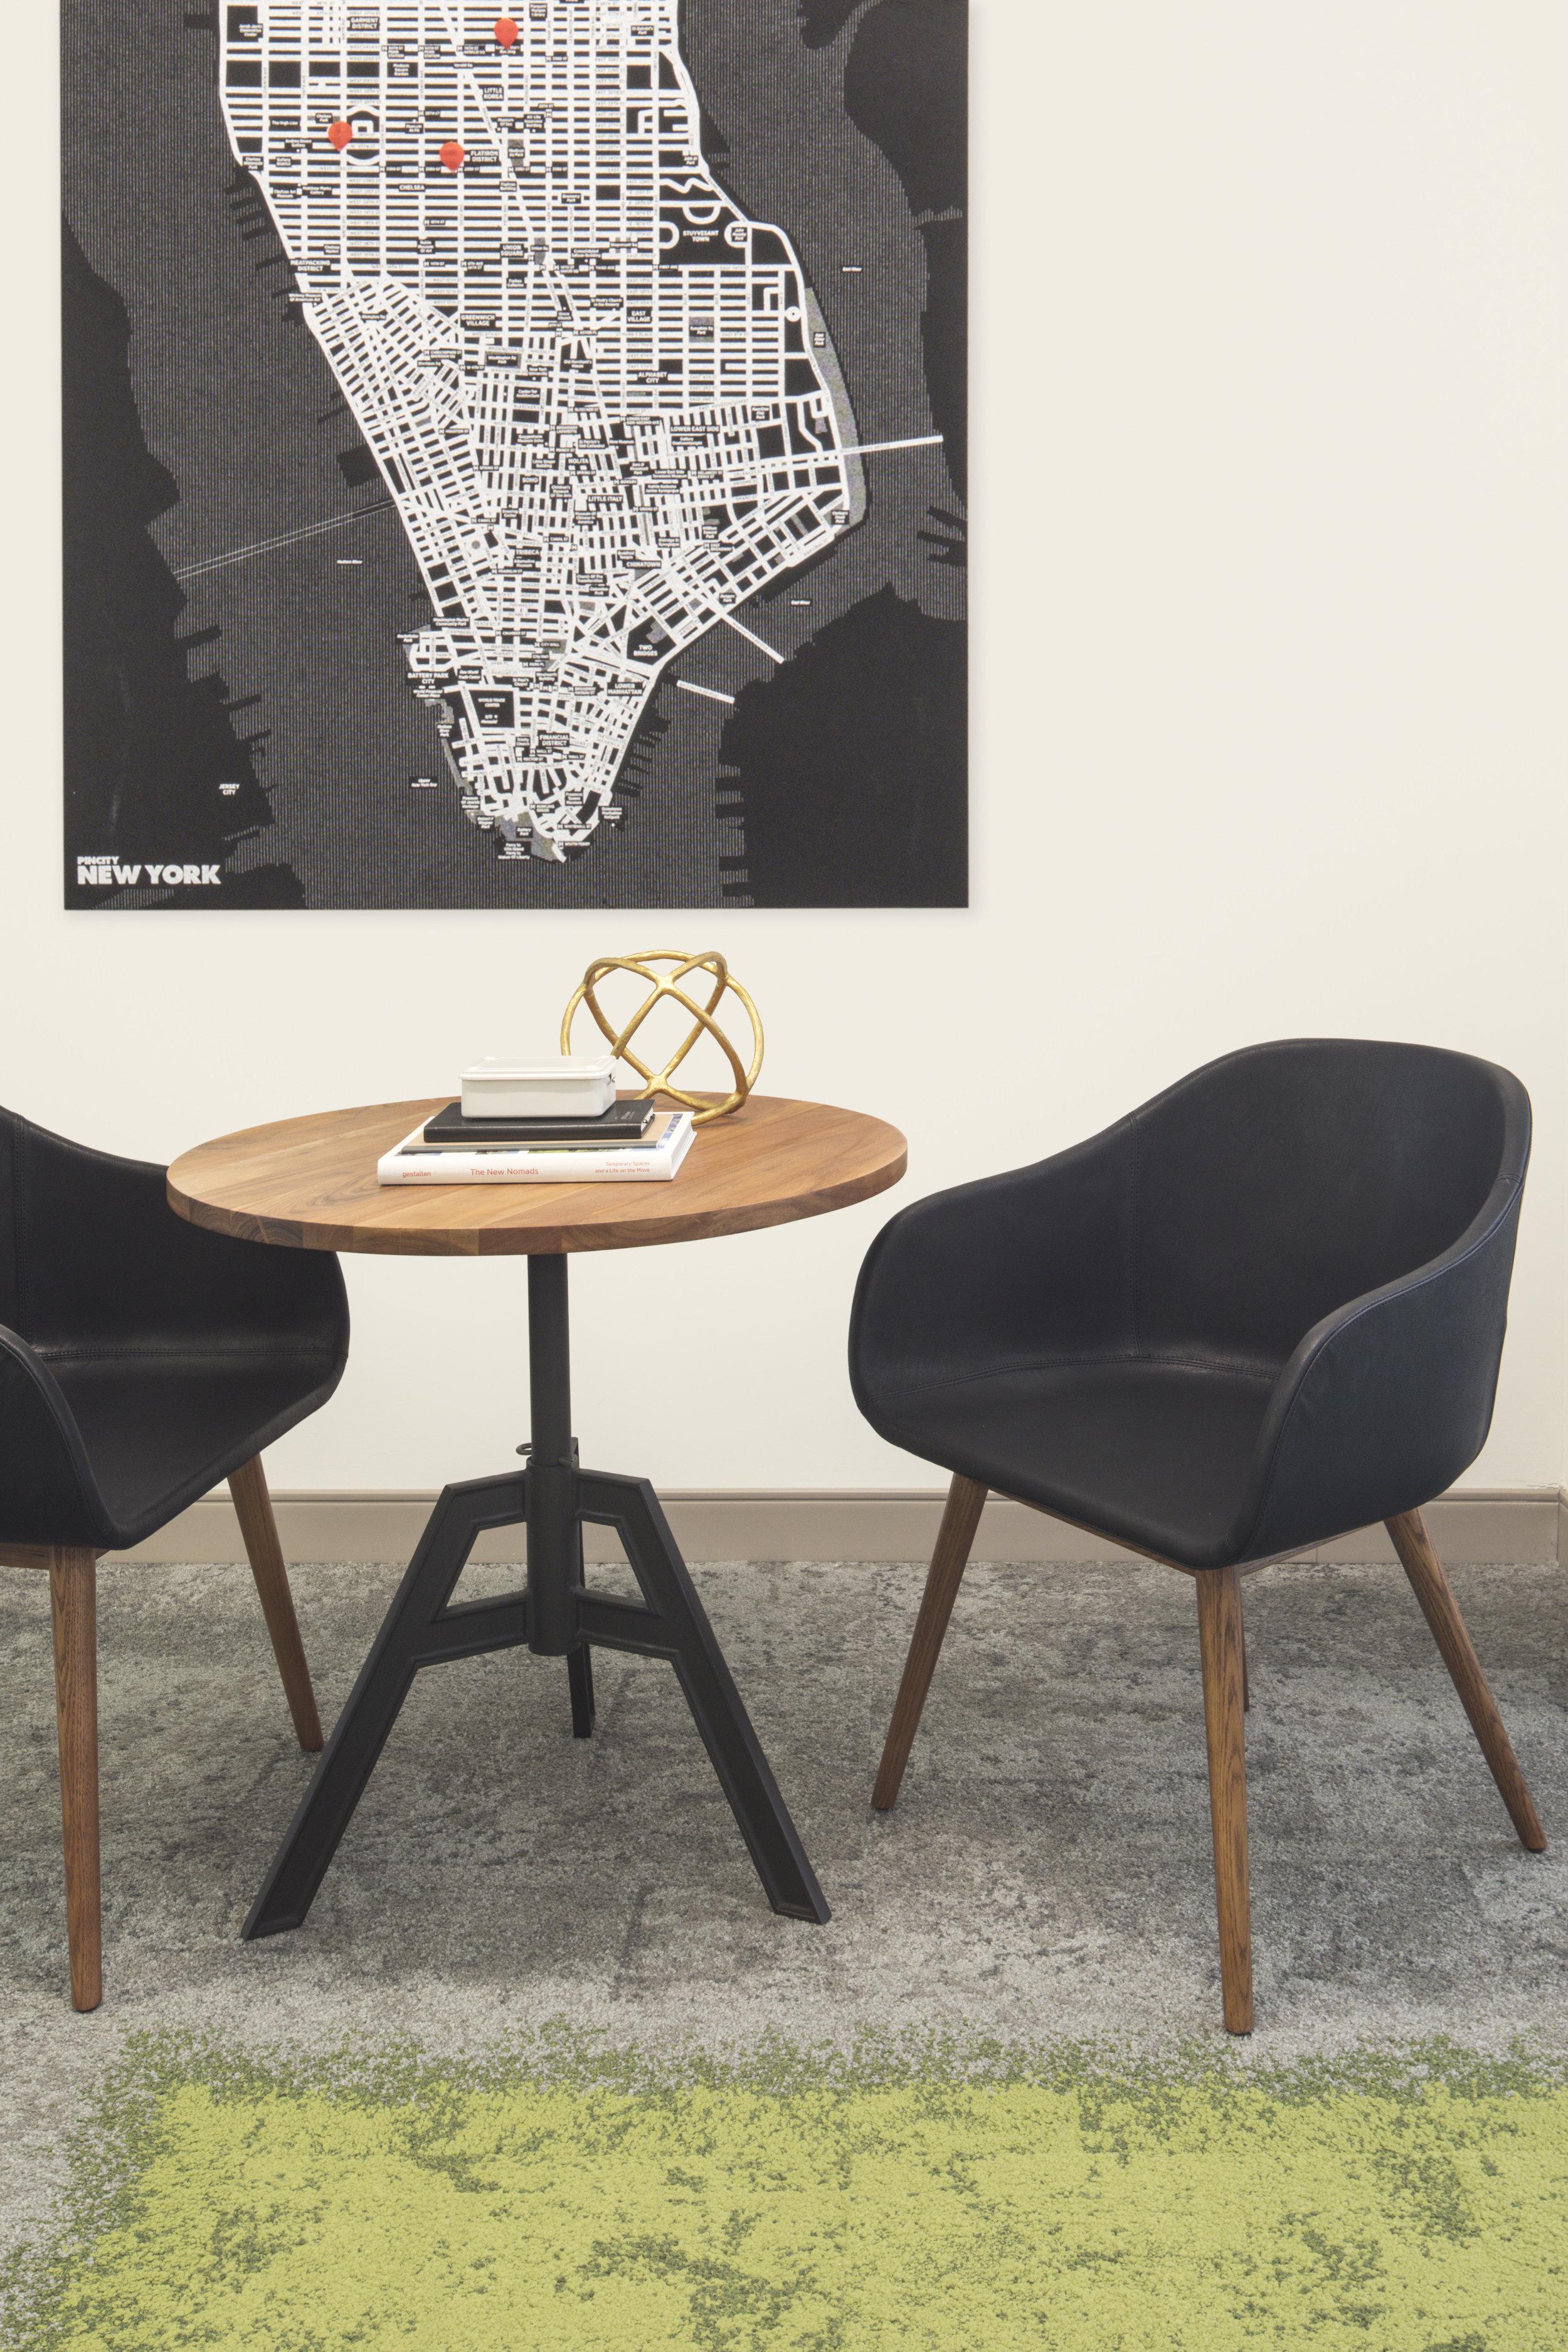 Empire-State-Building-Chrysler-Building-Waiting-Room-Leather-Chair-Art-Books-JMorrisDesign-Brooklyn-Interior-Designer.jpg